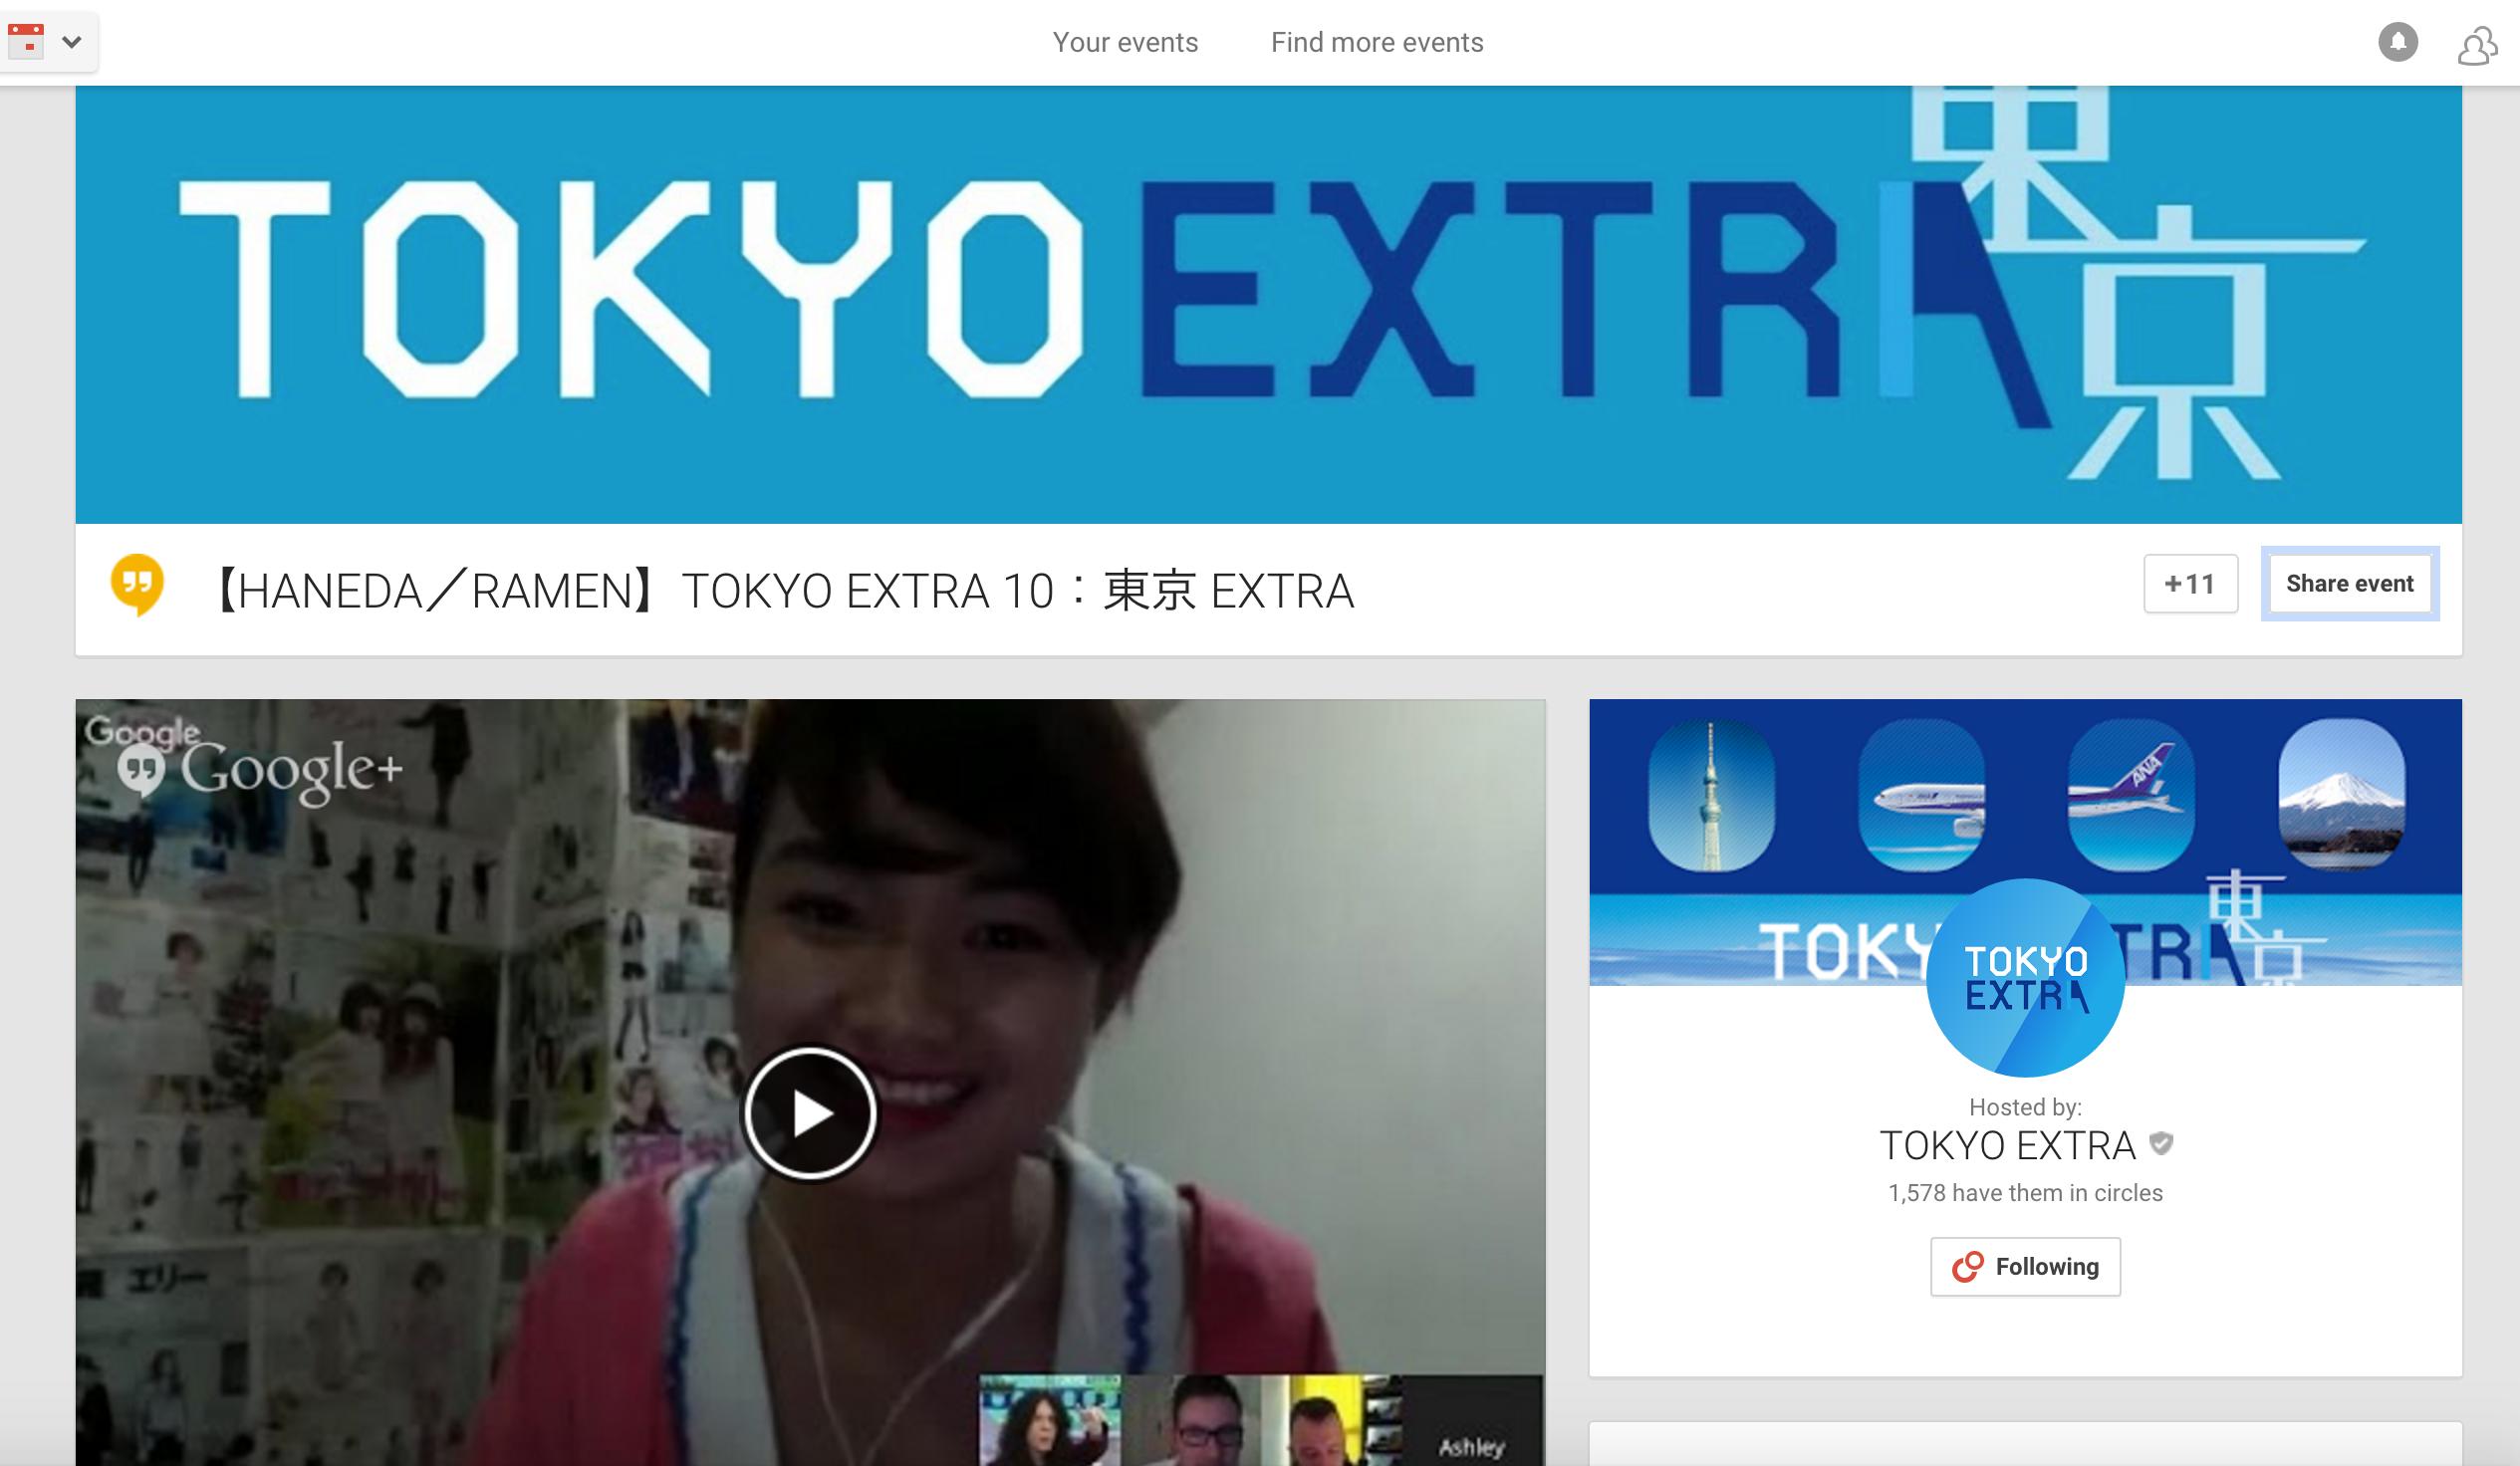 tokyo extra ashley